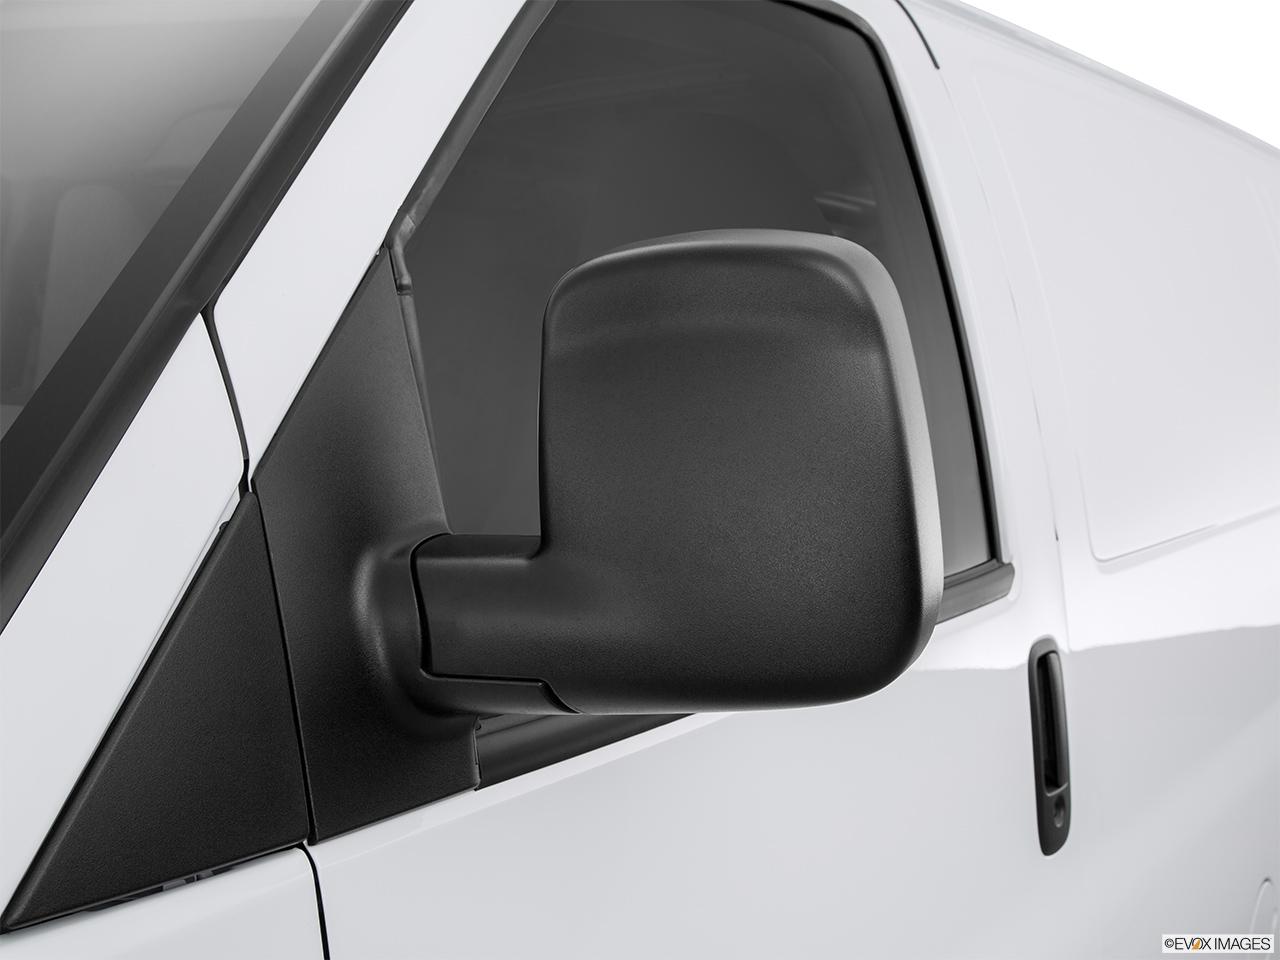 st jpg 2015 chevrolet express cargo van rwd 2500 155 paratransit driver s side mirror rear